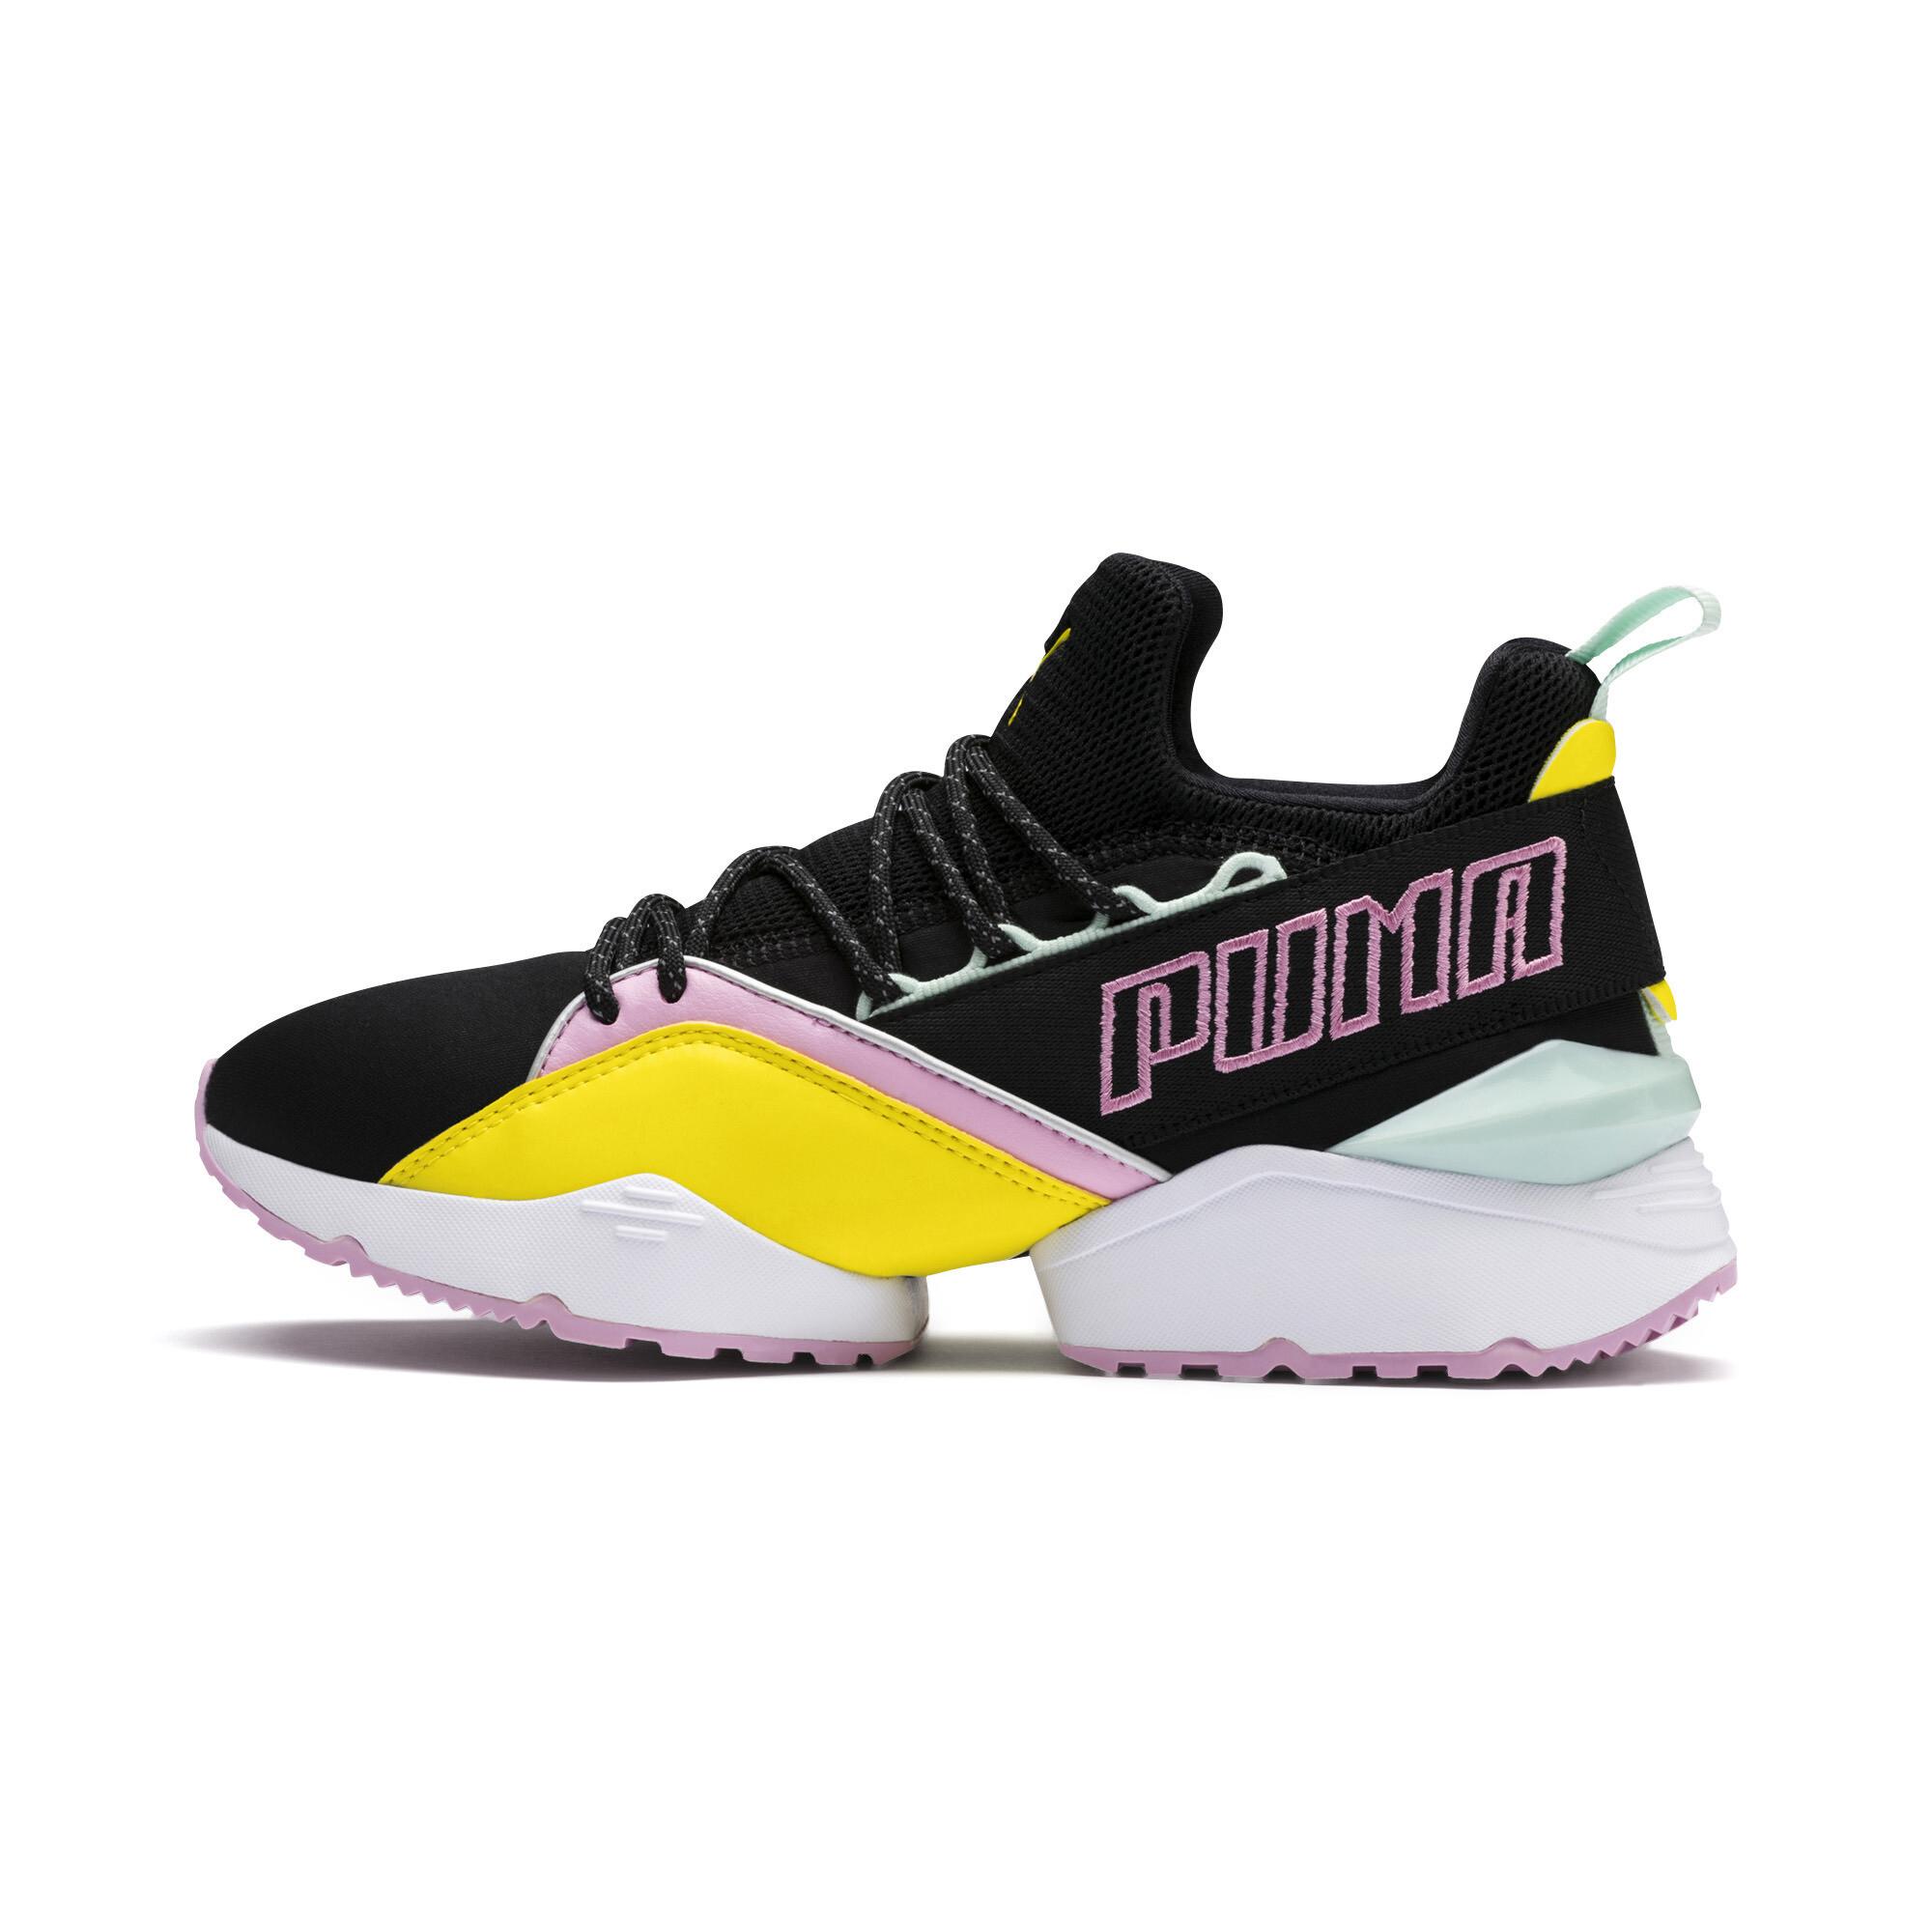 Image Puma Muse Maia TZ Women's Sneakers #1